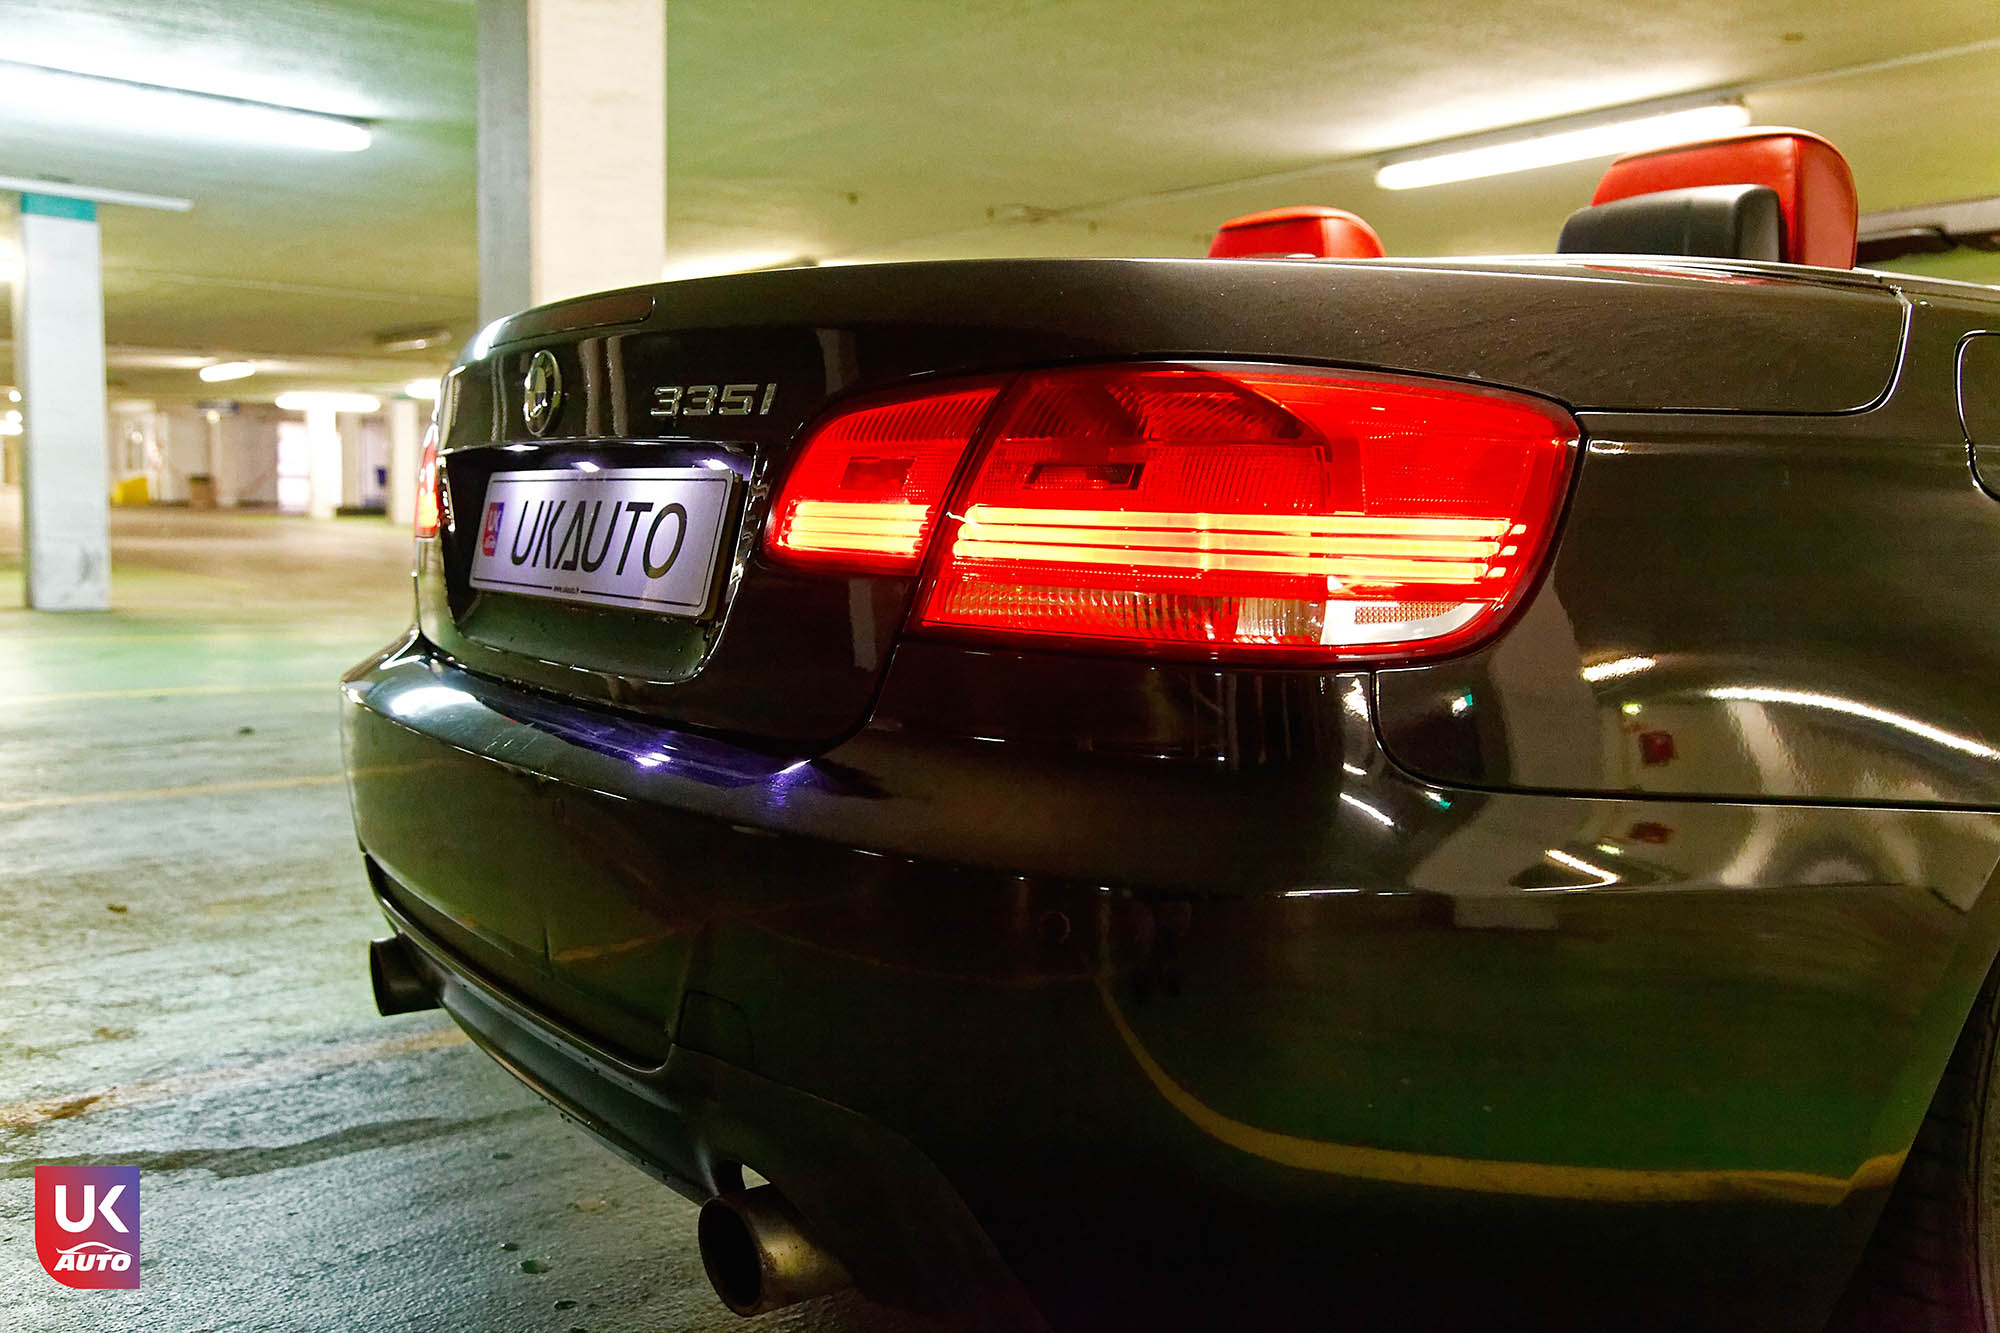 UKAUTO IMPORT ANGLETERRE BMW 335i CABRIOLET UKA RHD49 - Felecitation a Jeremie pour cette BMW 335i cabriolet RHD PACK M IMPORT AUTO ANGLAISE